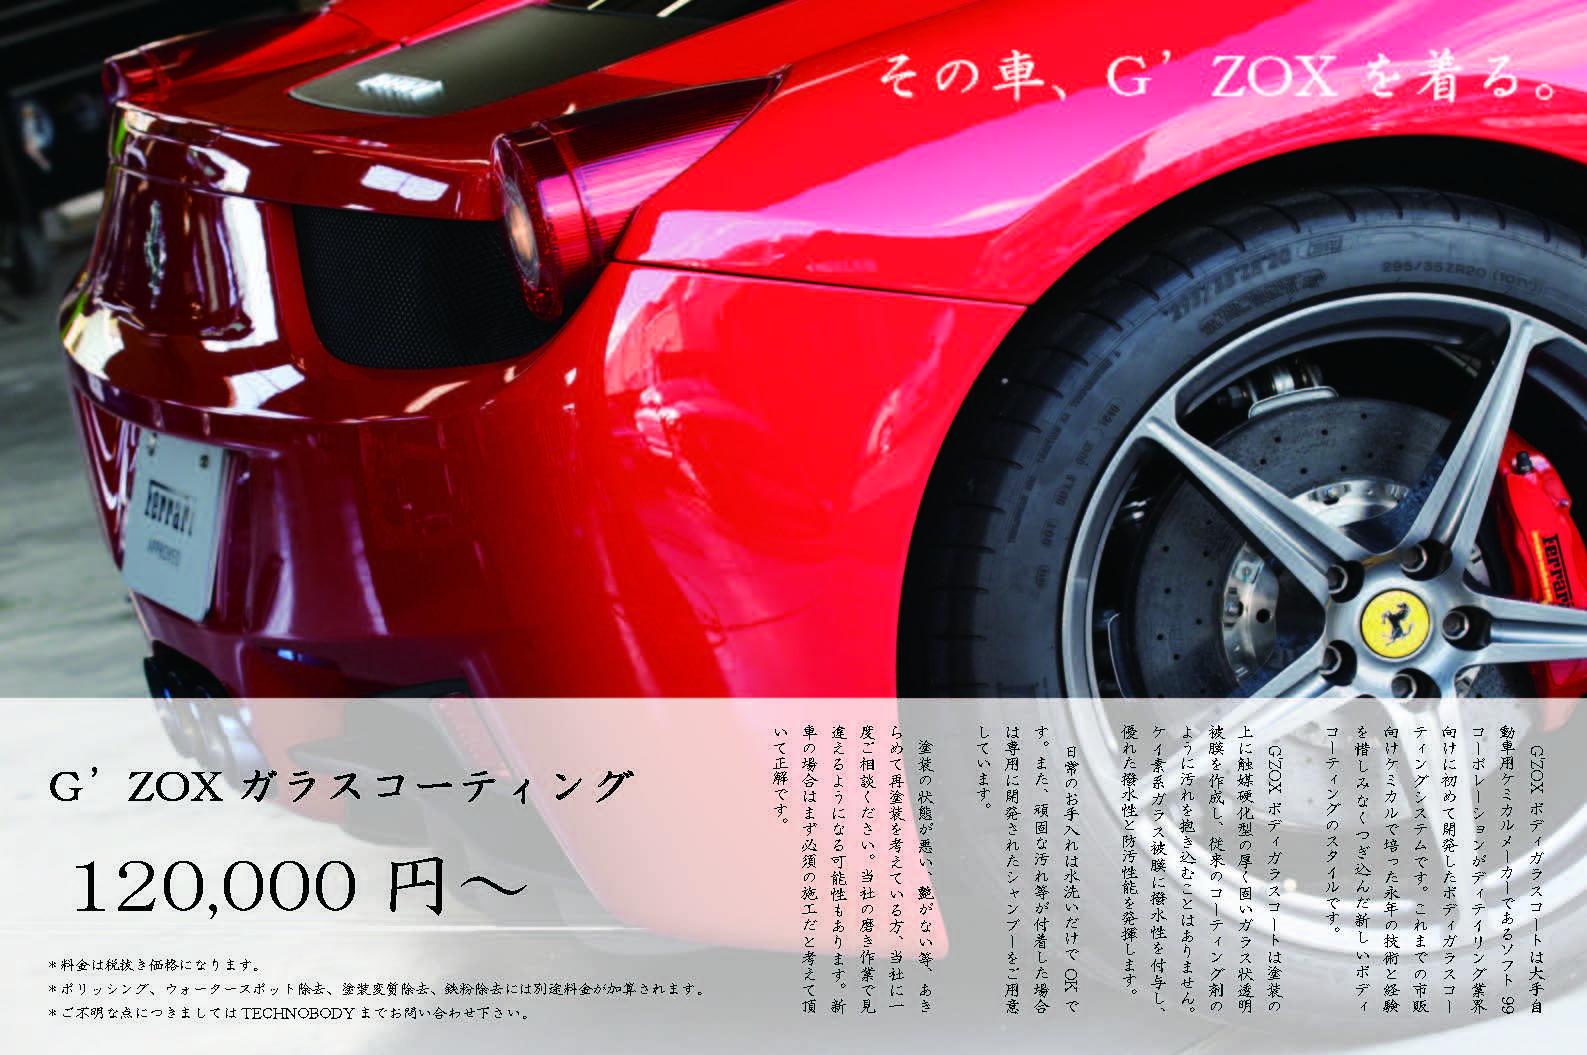 Ferrari13Fin_ページ_4Ferrari13Fin_ページ_4